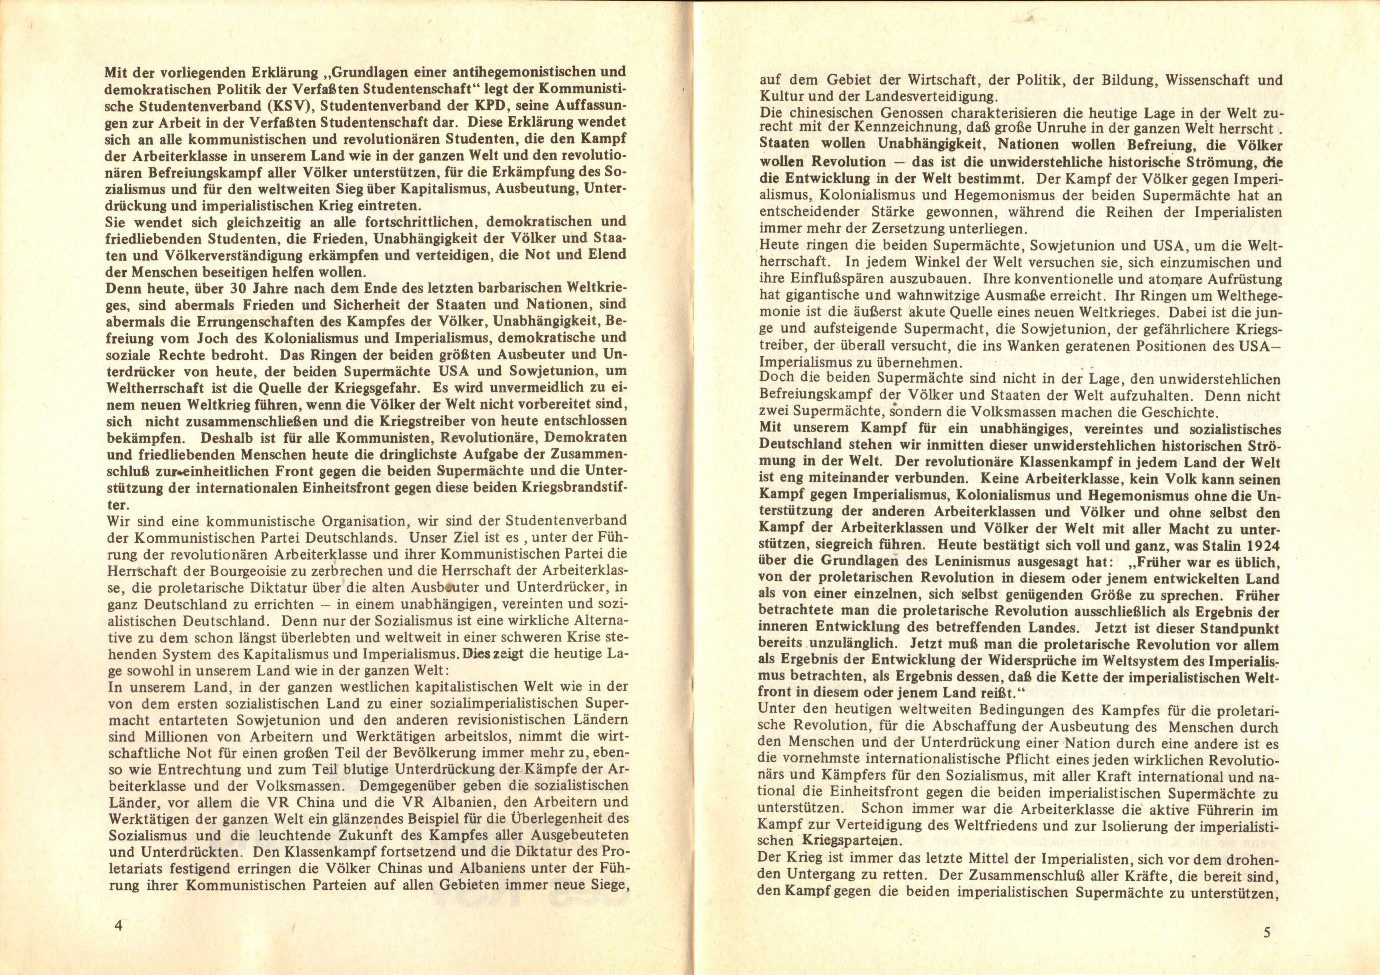 KSV_1976_Verfasste_Studentenschaft_04